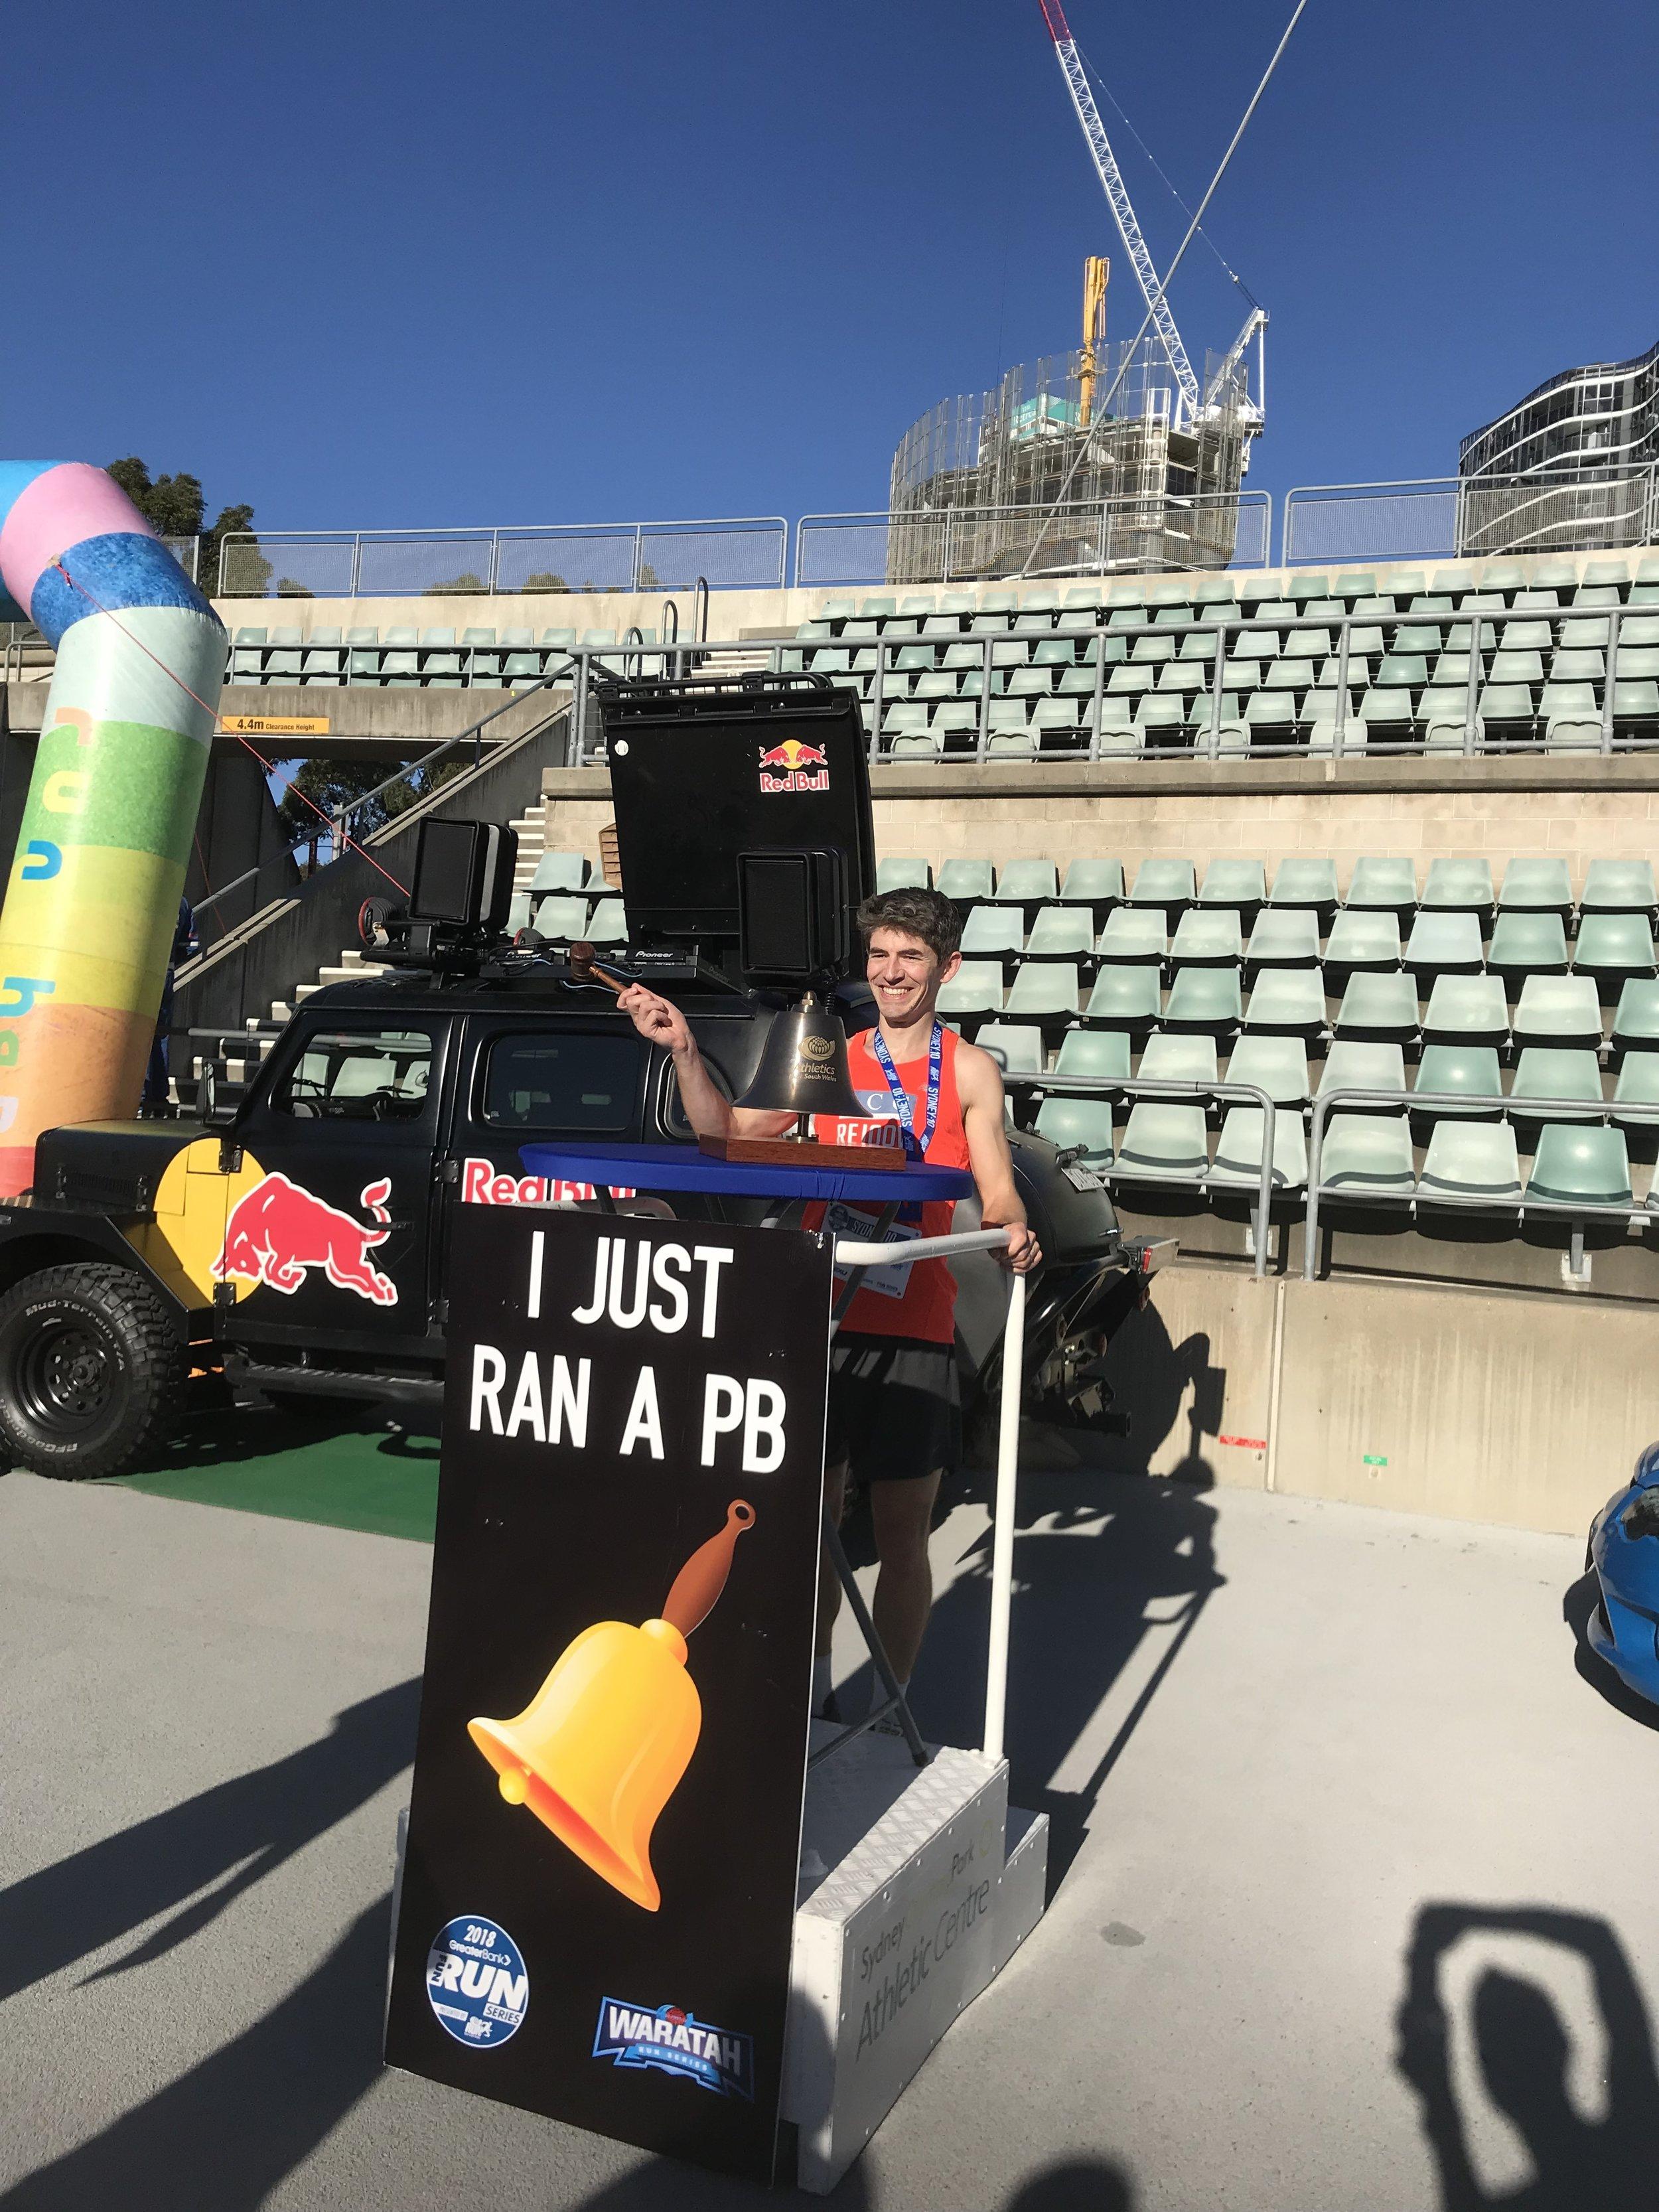 Mark Higgs - 33.35 Sydney 10k 2018 a 2.5min PB